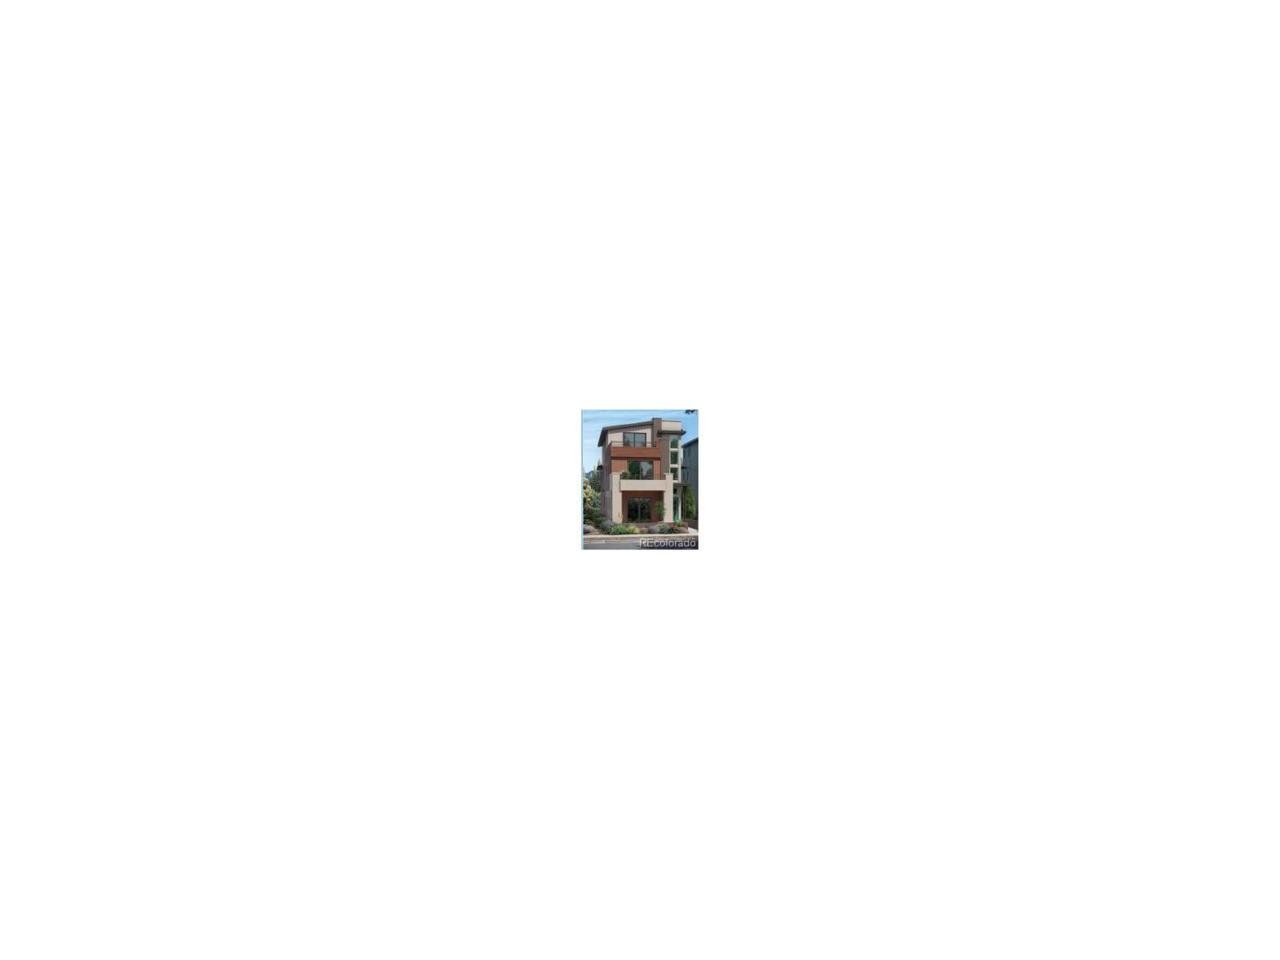 6690 Morrison Drive, Denver, CO 80221 (MLS #3256006) :: 8z Real Estate